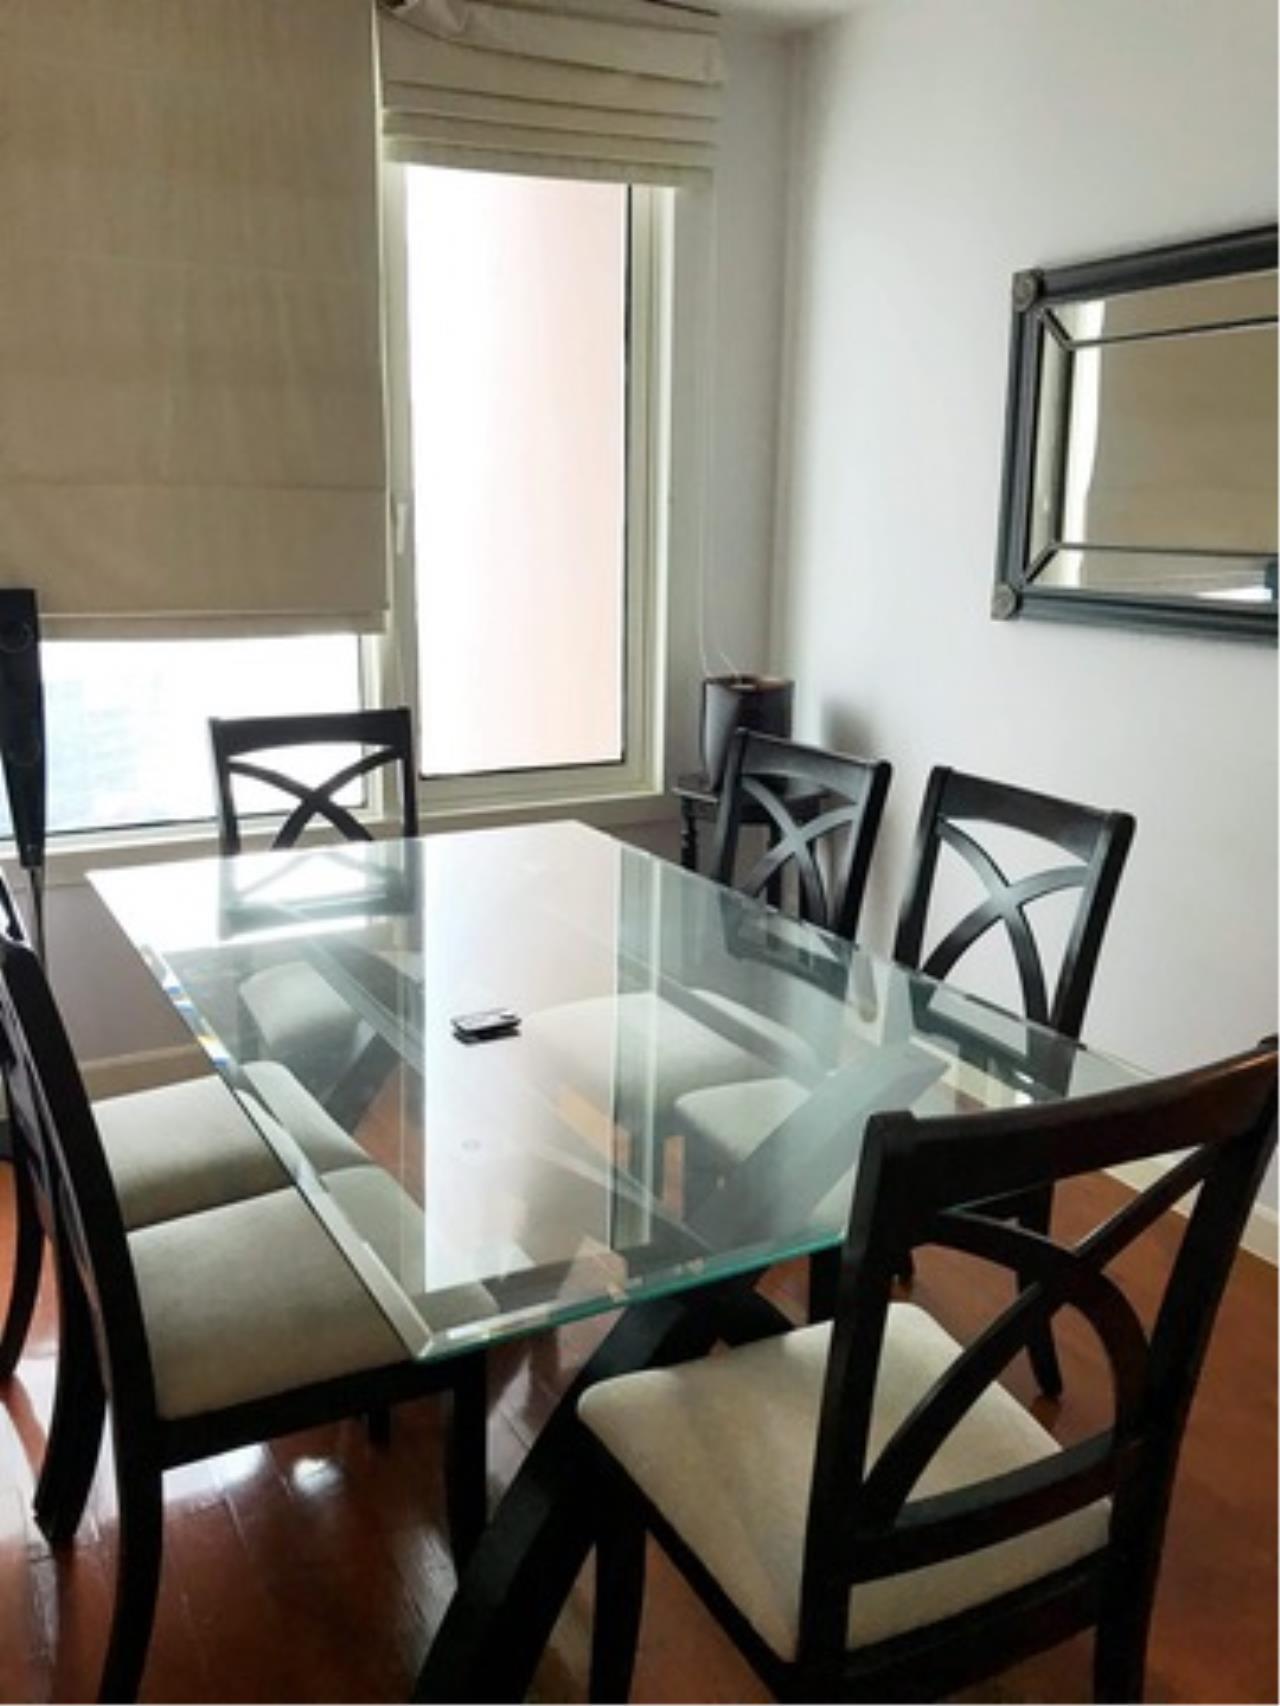 Ta (+66 9 5935 1592) Agency's SALE Condo Siri Residence by Sansiri 2 Bed near BTS Prompong Thonglor Emporium Best Price (163,000B/sqm) 2